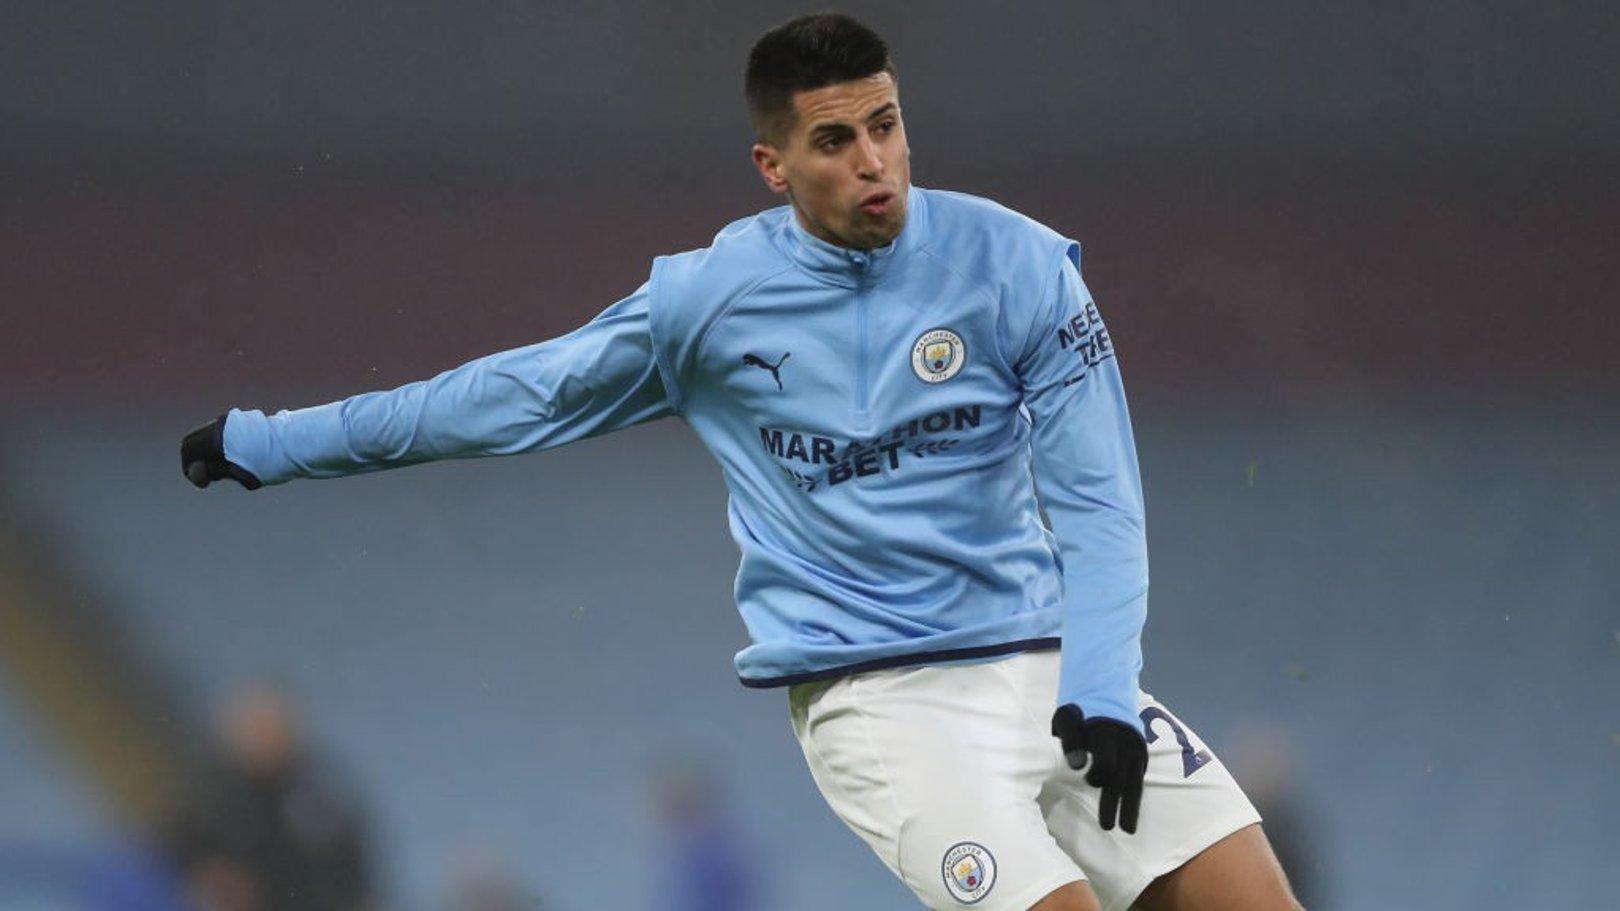 City make three changes for Aston Villa